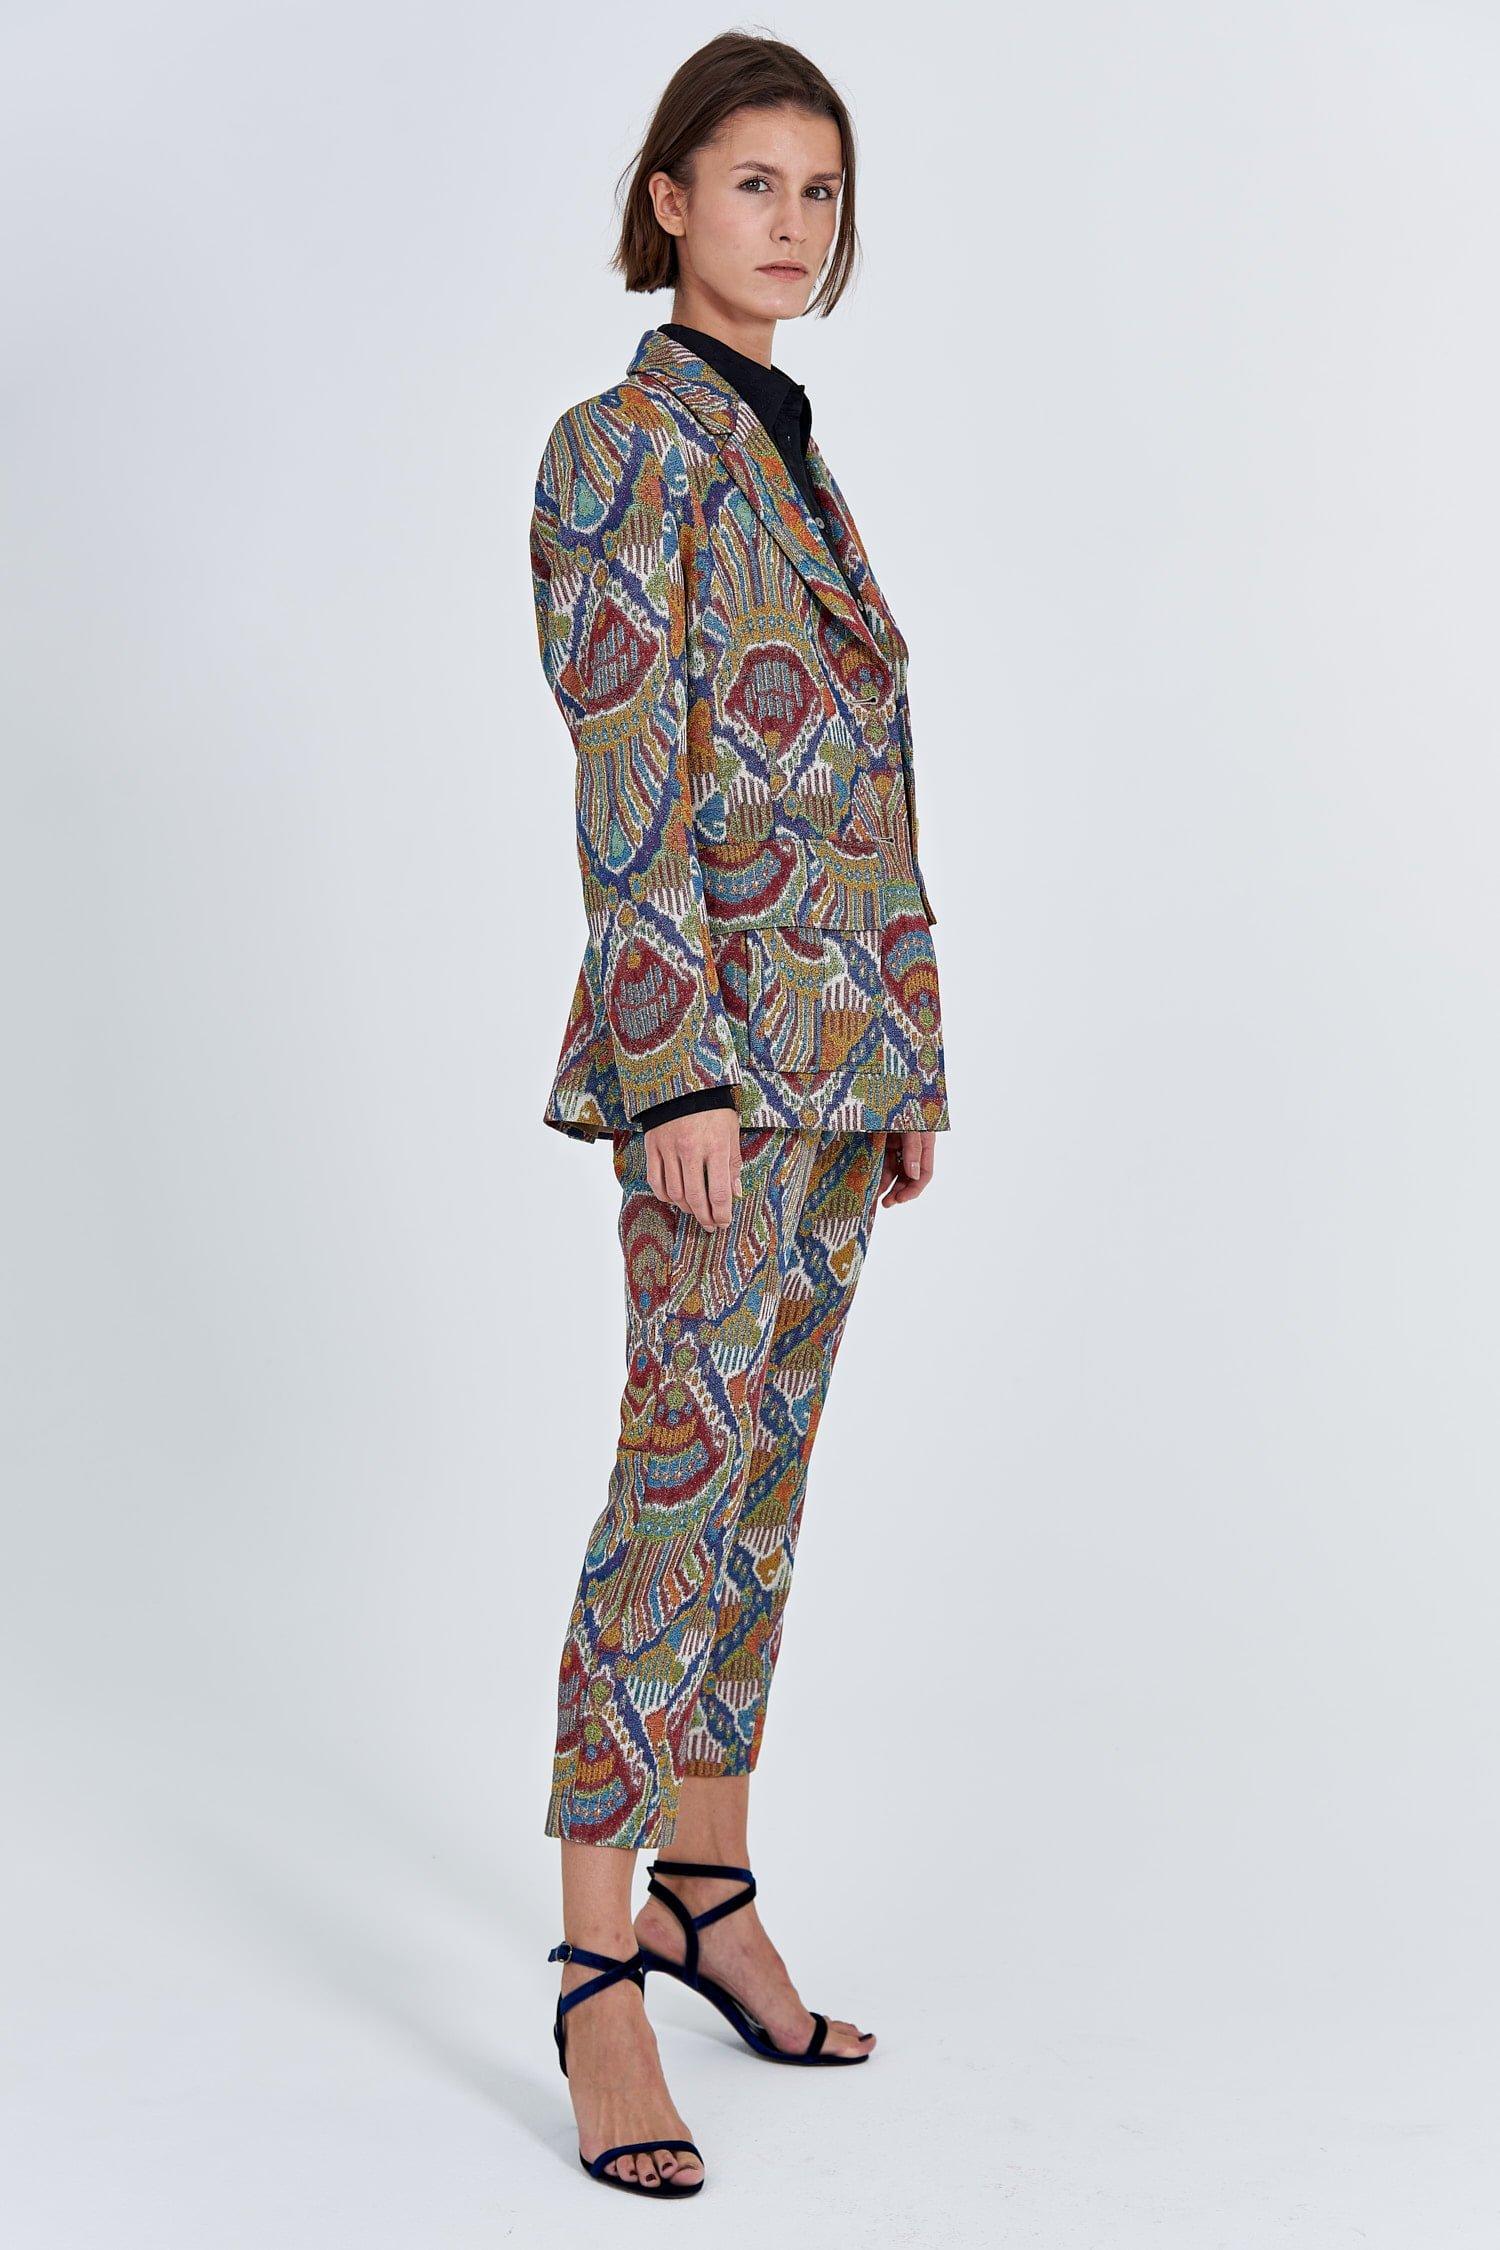 Acephala Fw 2020 21 Jacquard Suit Jacket Front Side